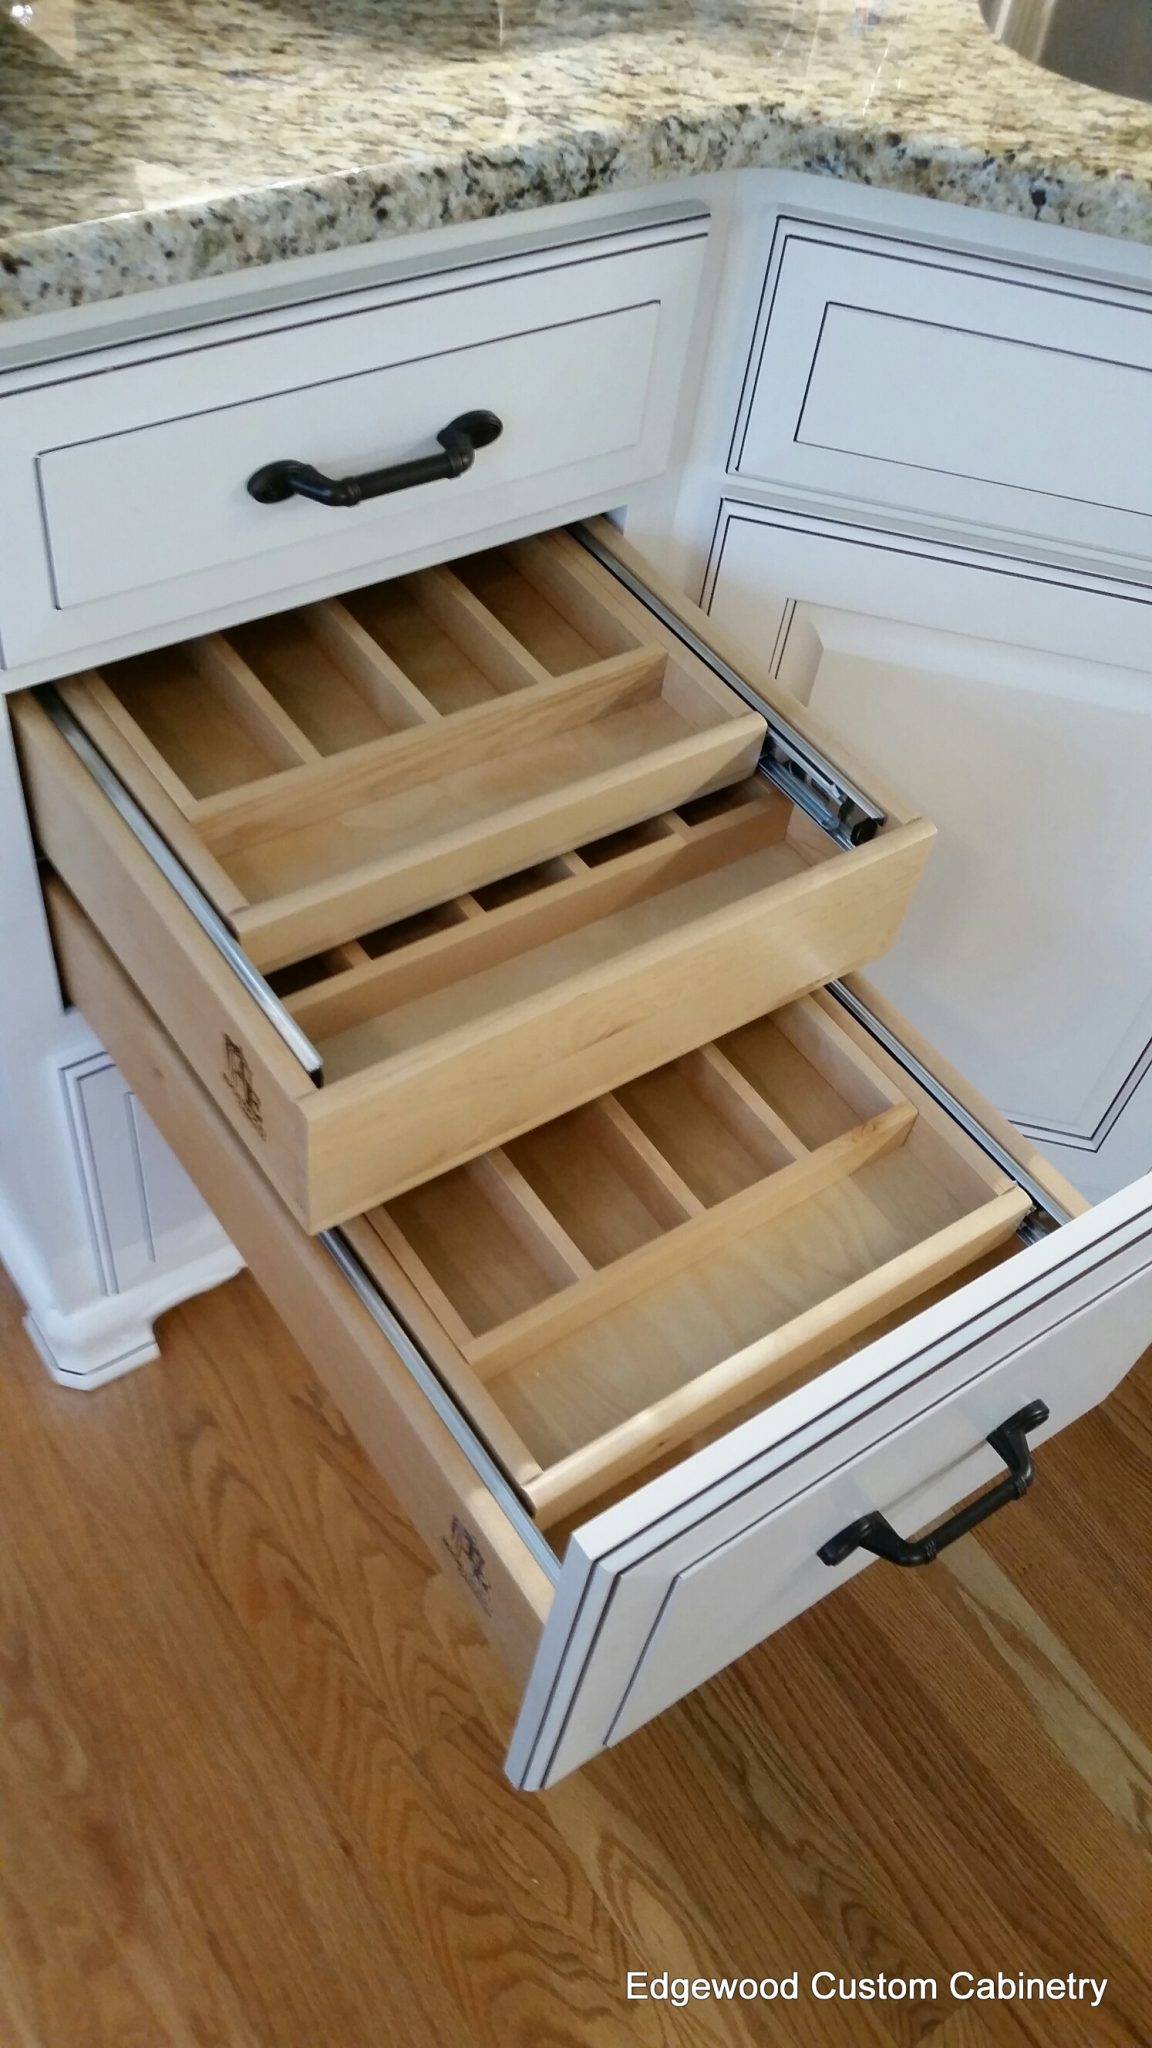 Kitchen Design Must Haves Kitchen Design Must Haves Edgewood Cabinetry